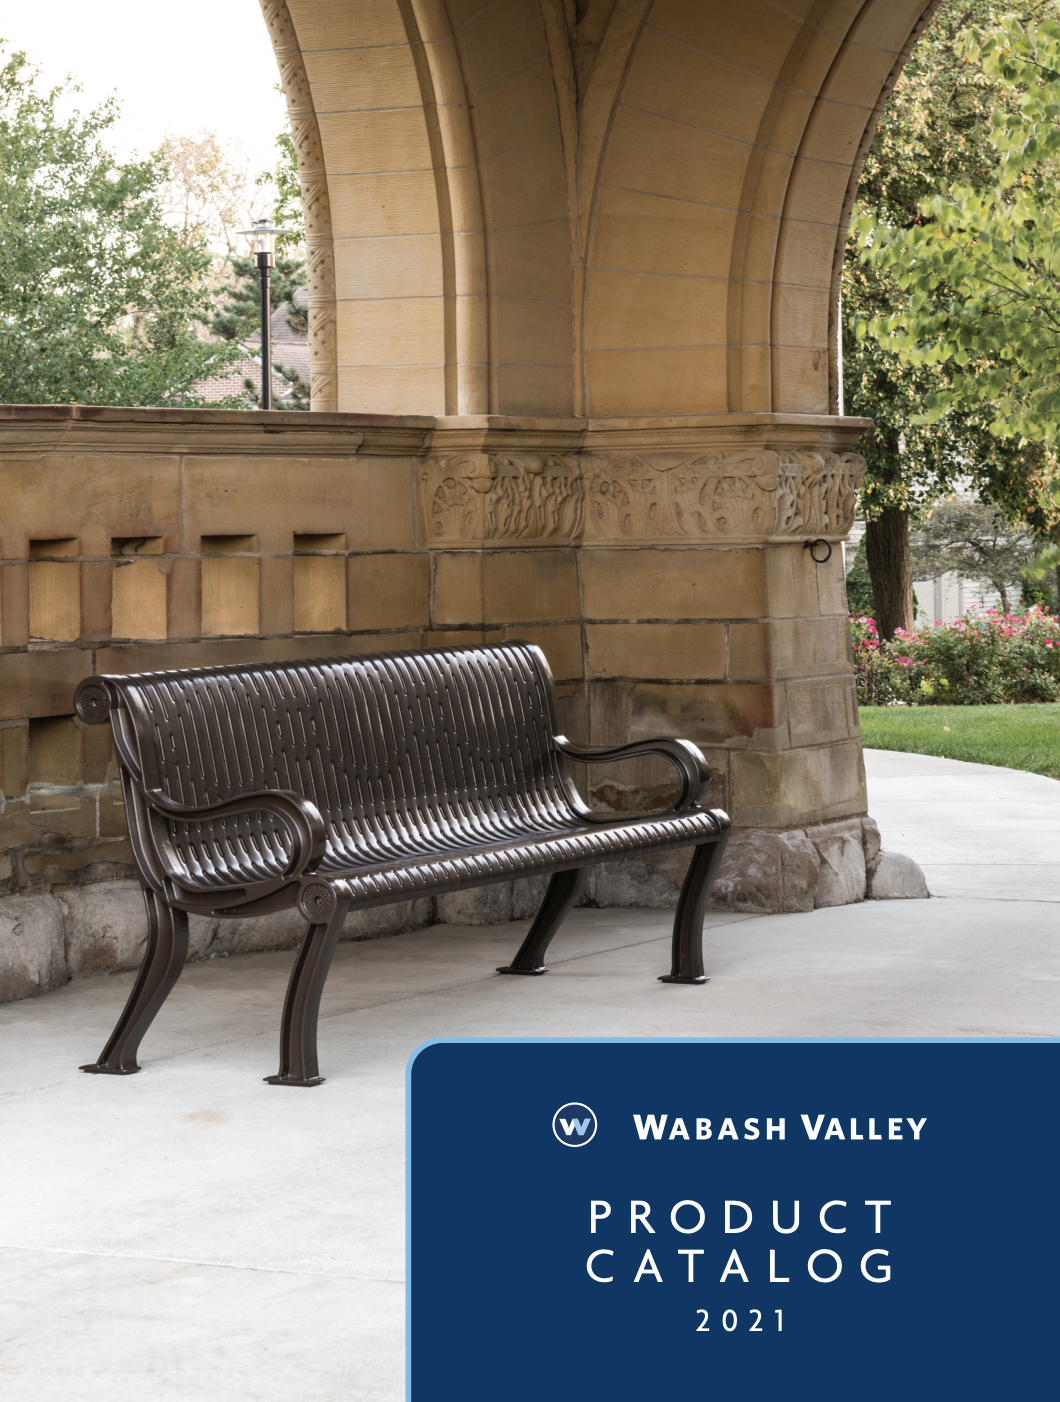 Wabash Valley Product Catalog